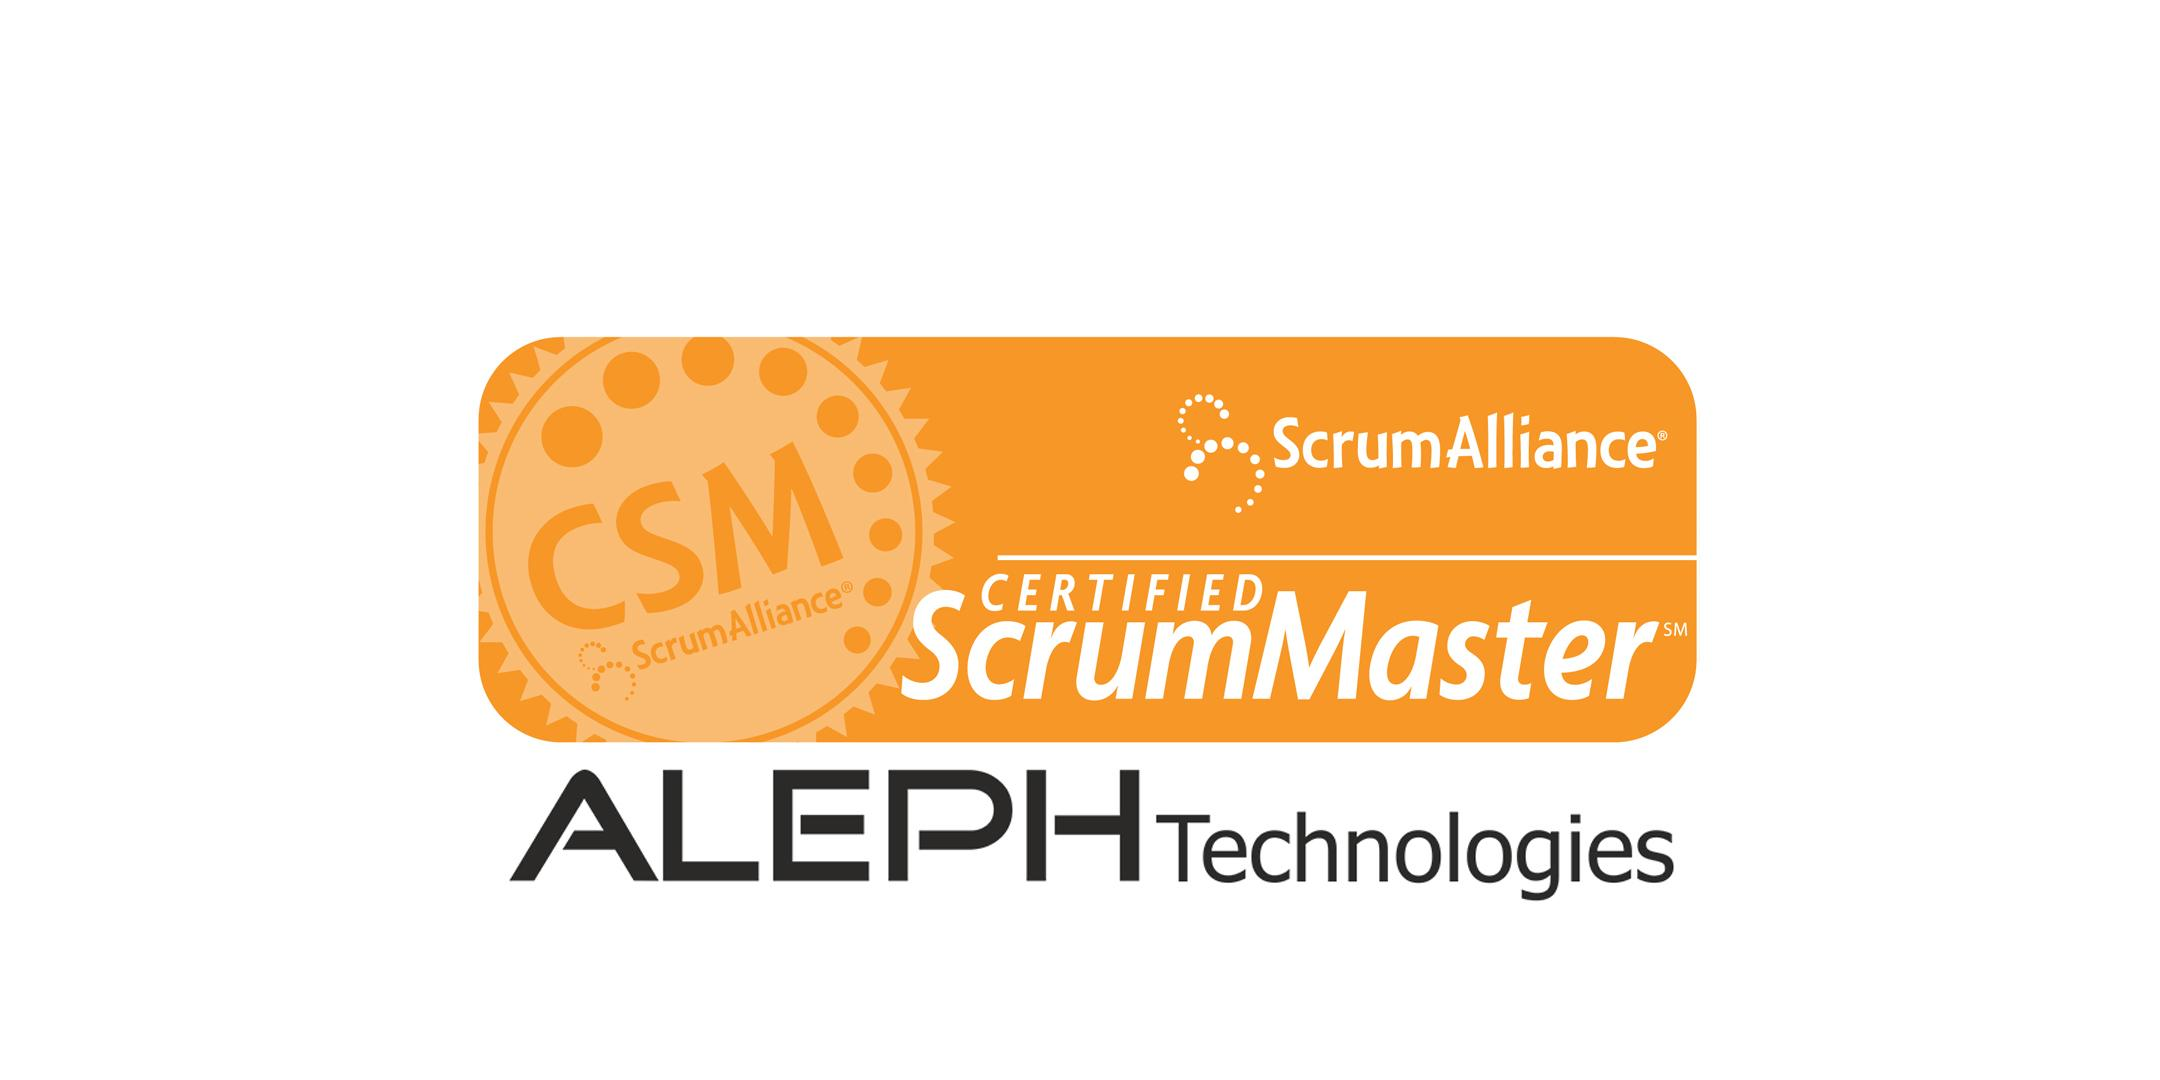 Certified Scrum Master Workshop Csm Dallas Monmay 30th Tue